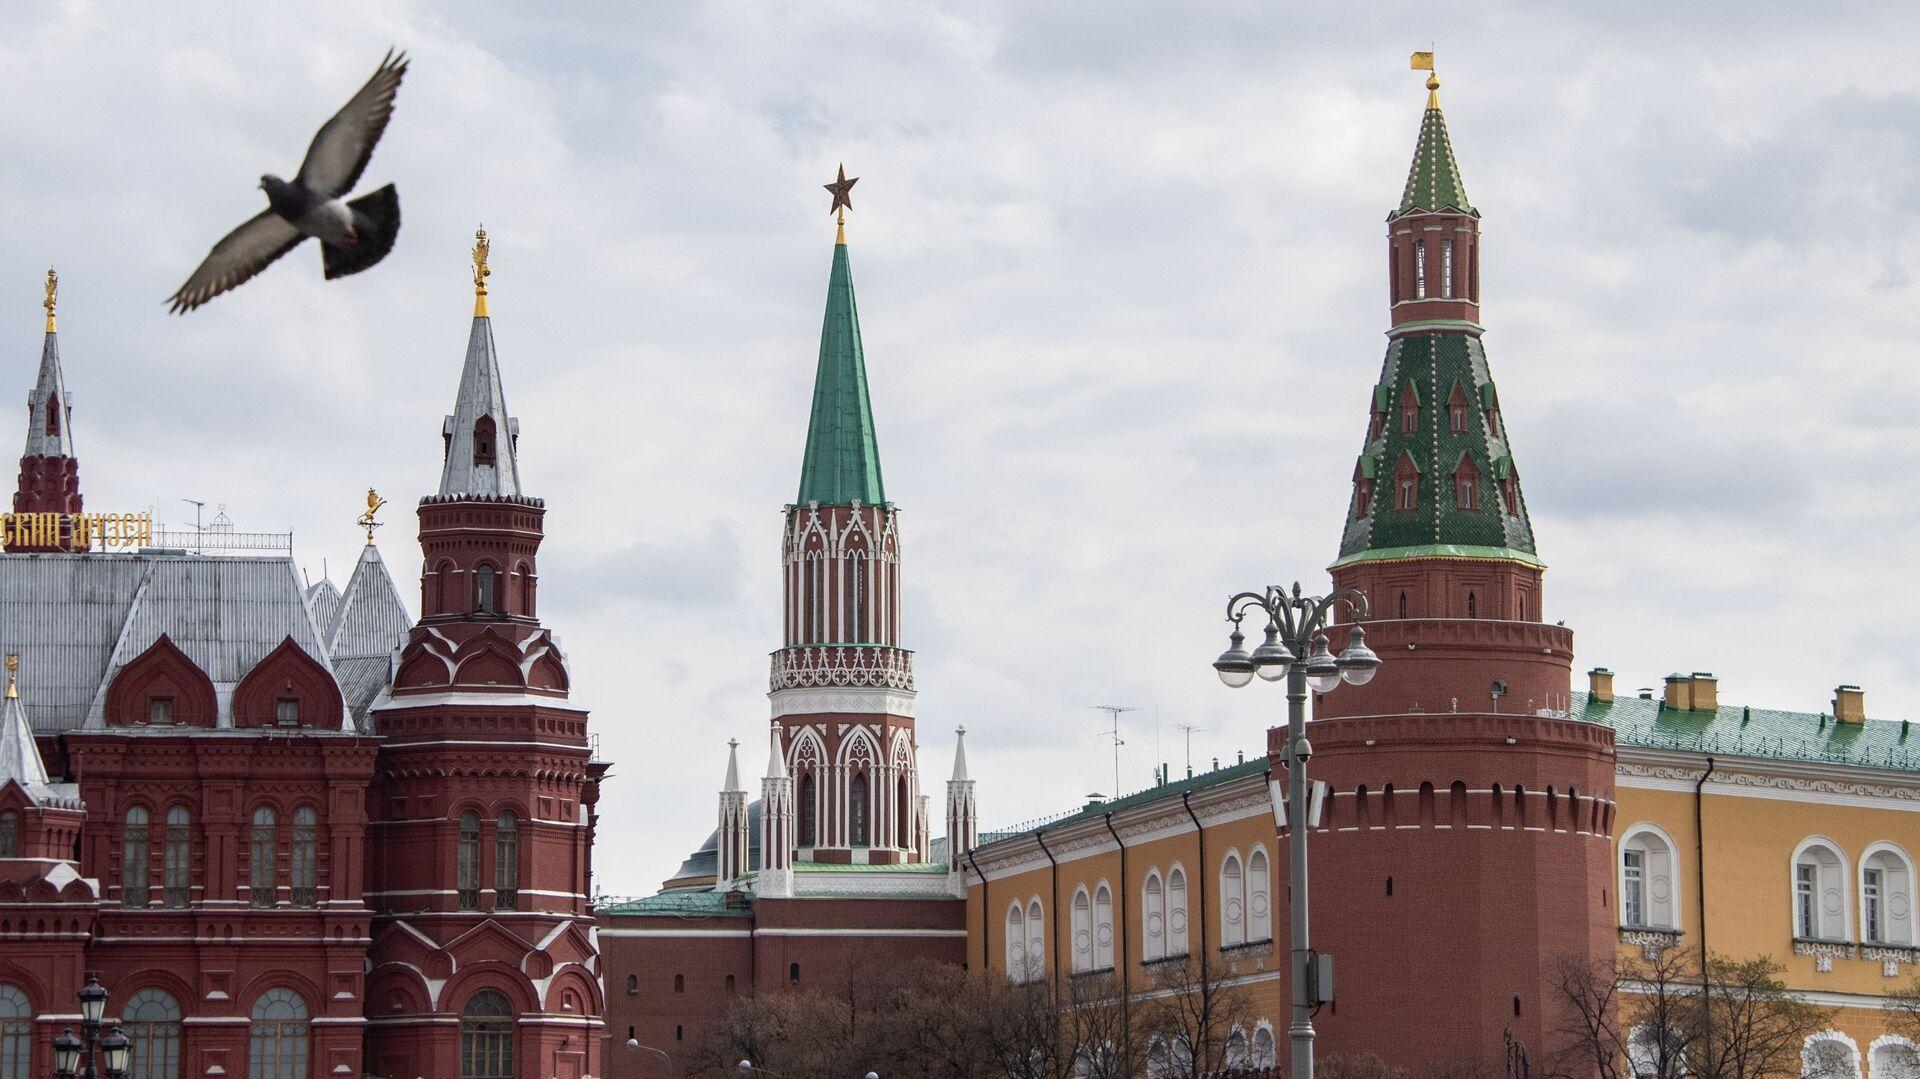 Поглед на московски Кремљ - Sputnik Србија, 1920, 08.10.2021